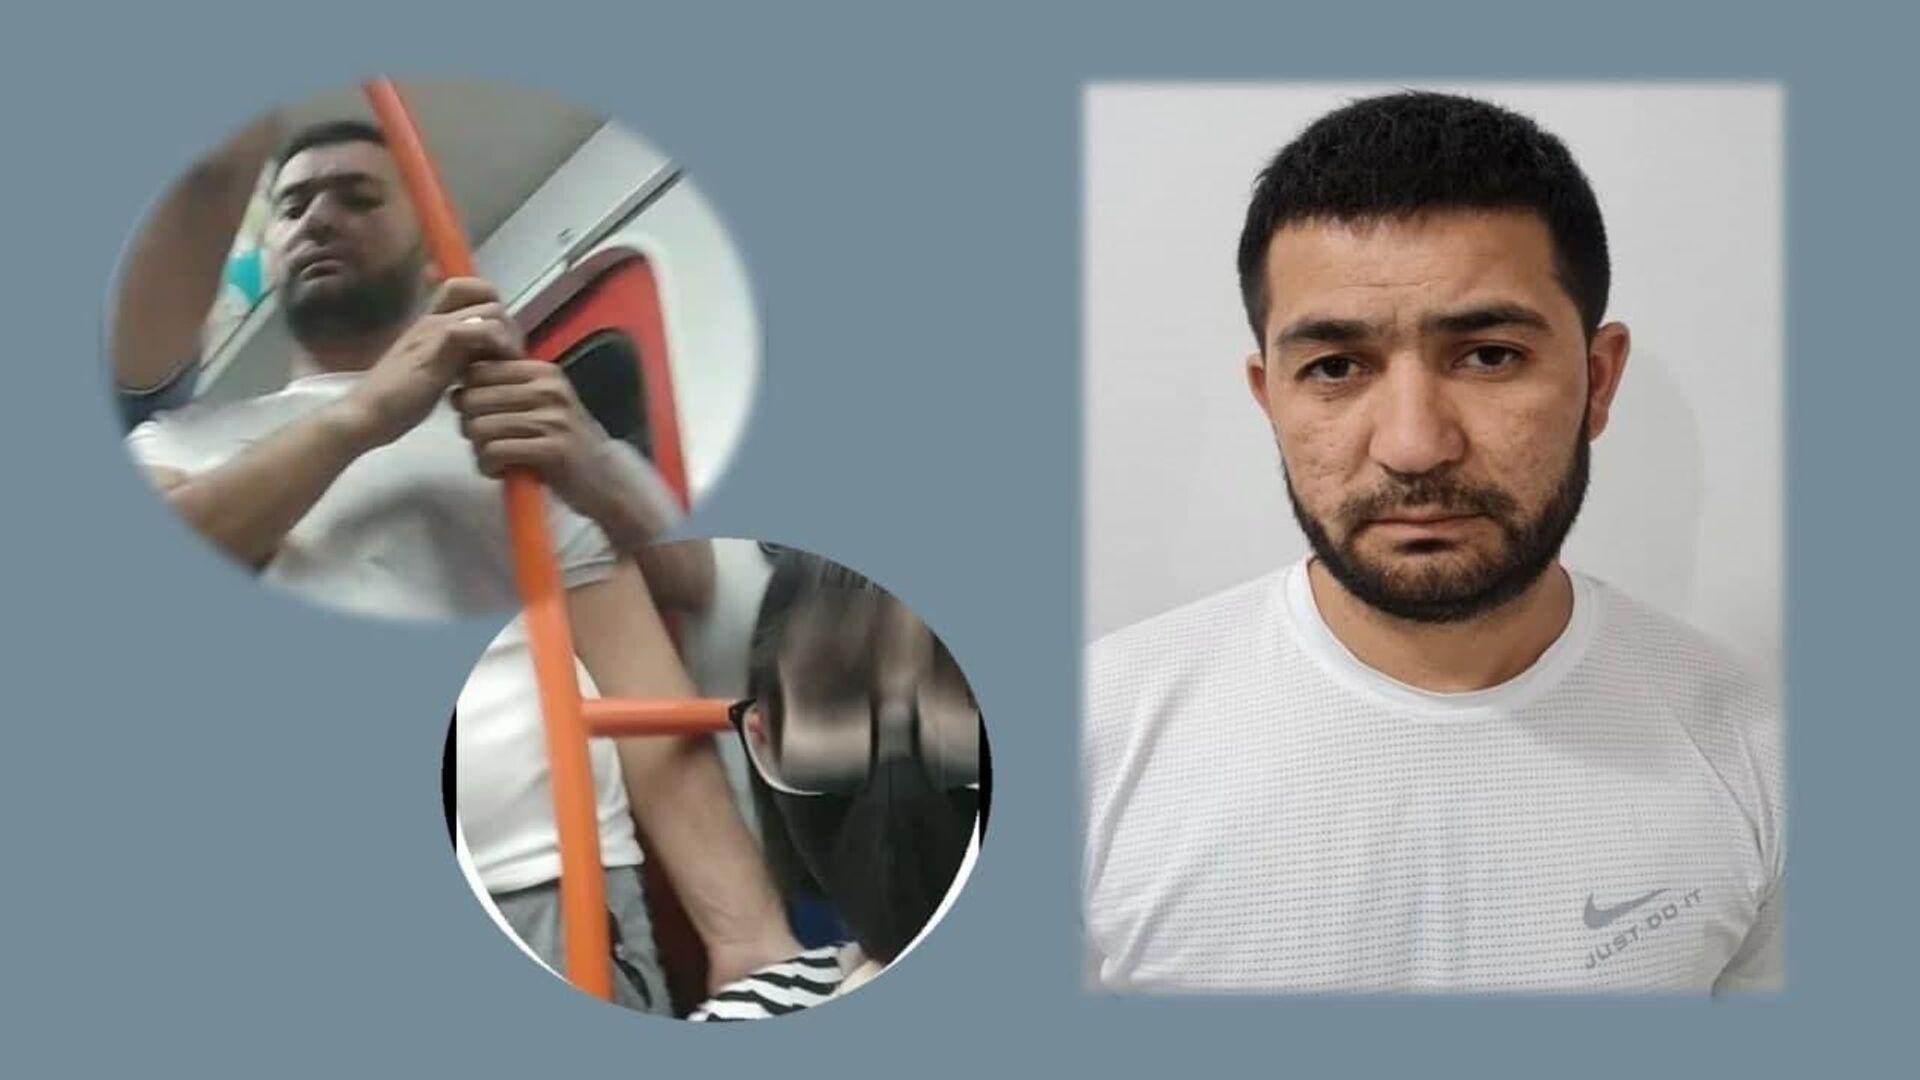 Мужчина, пристававший к подростку в ташкентском метро, сентябрь, 2021 год - Sputnik Узбекистан, 1920, 23.09.2021